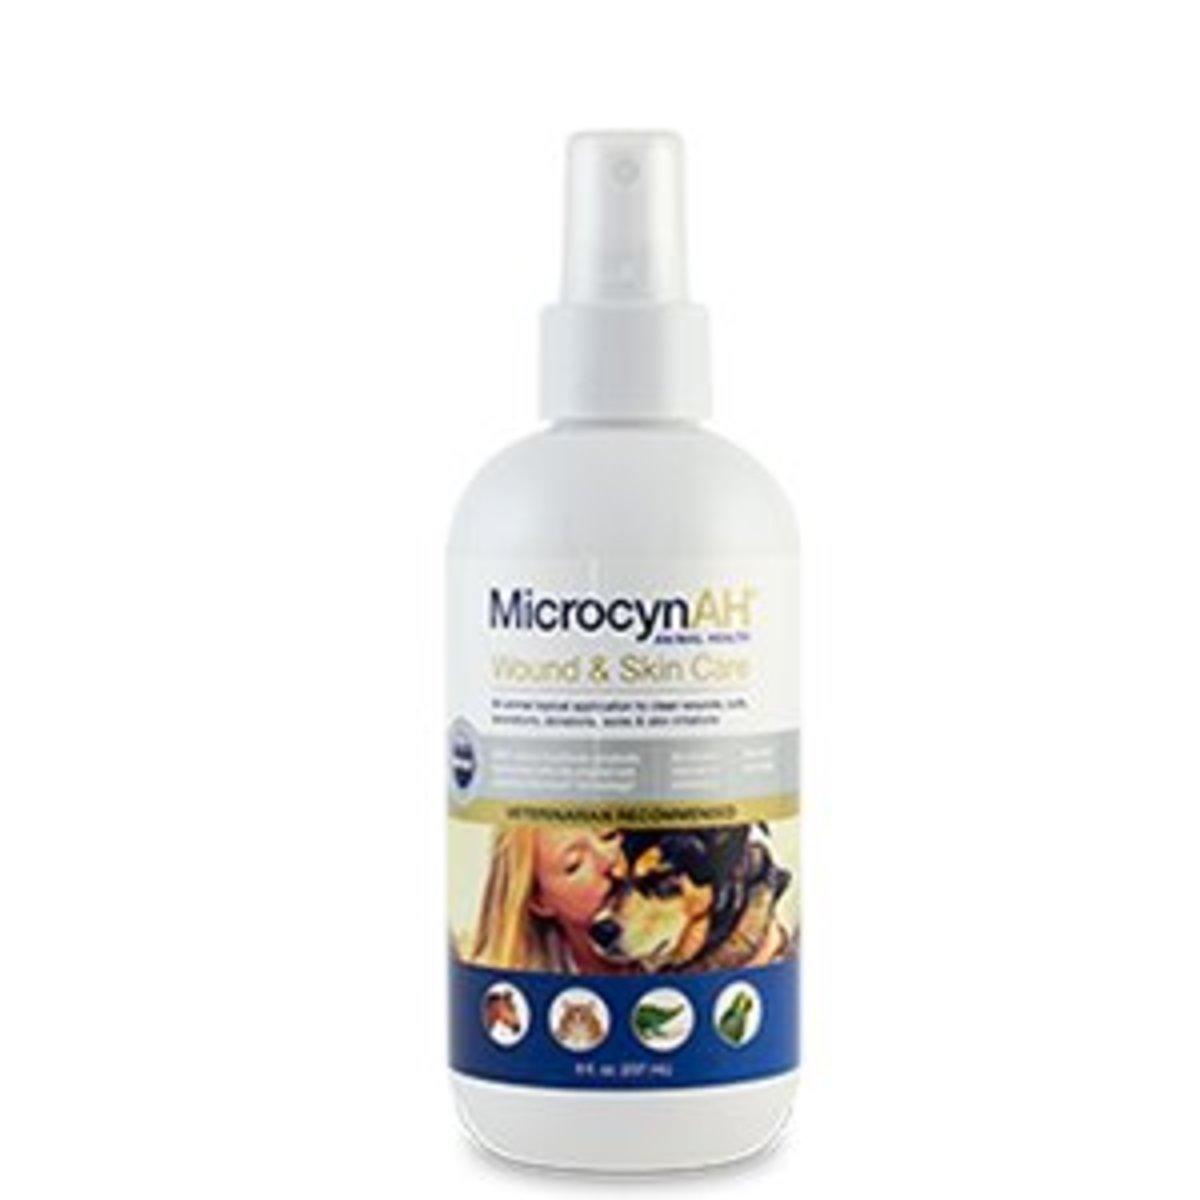 Wound & Skin Care Liquid Spray (8oz / 236ml) #M1002